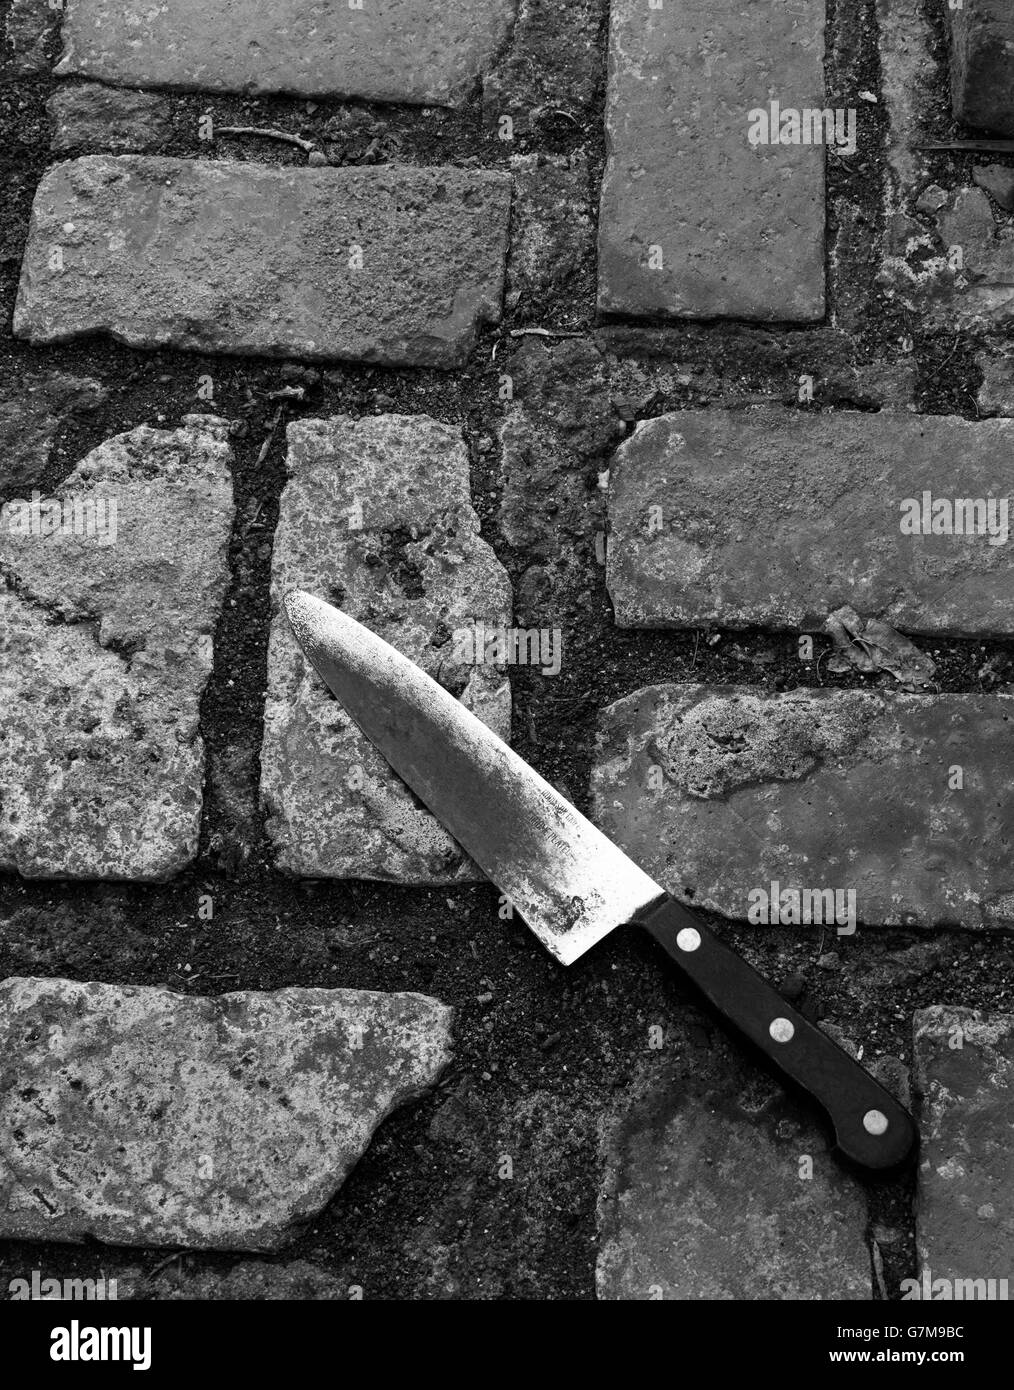 Knife laying on brick paving - Stock Image